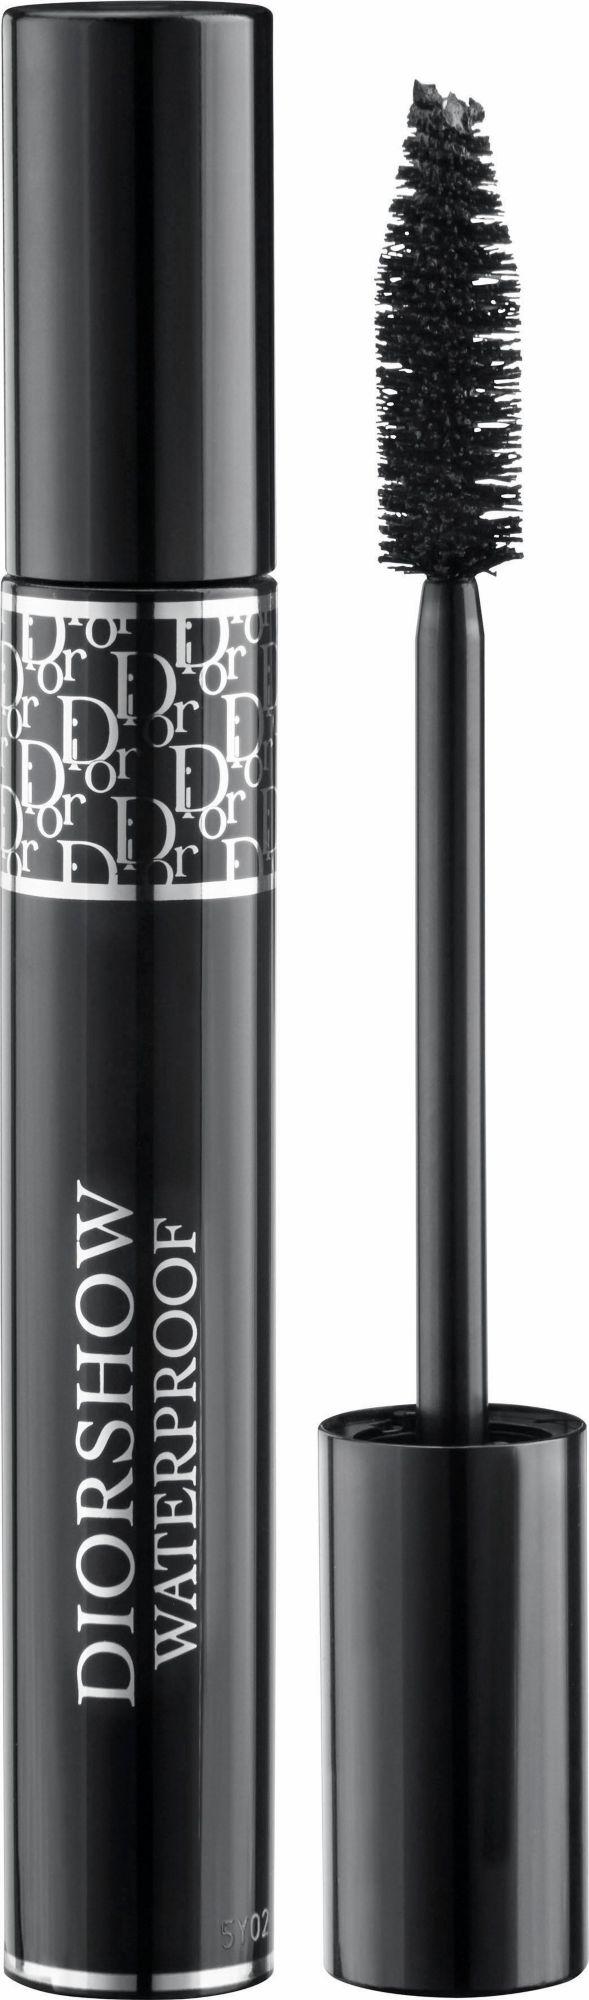 DIOR Dior, »Diorshow Waterproof«, Mascara